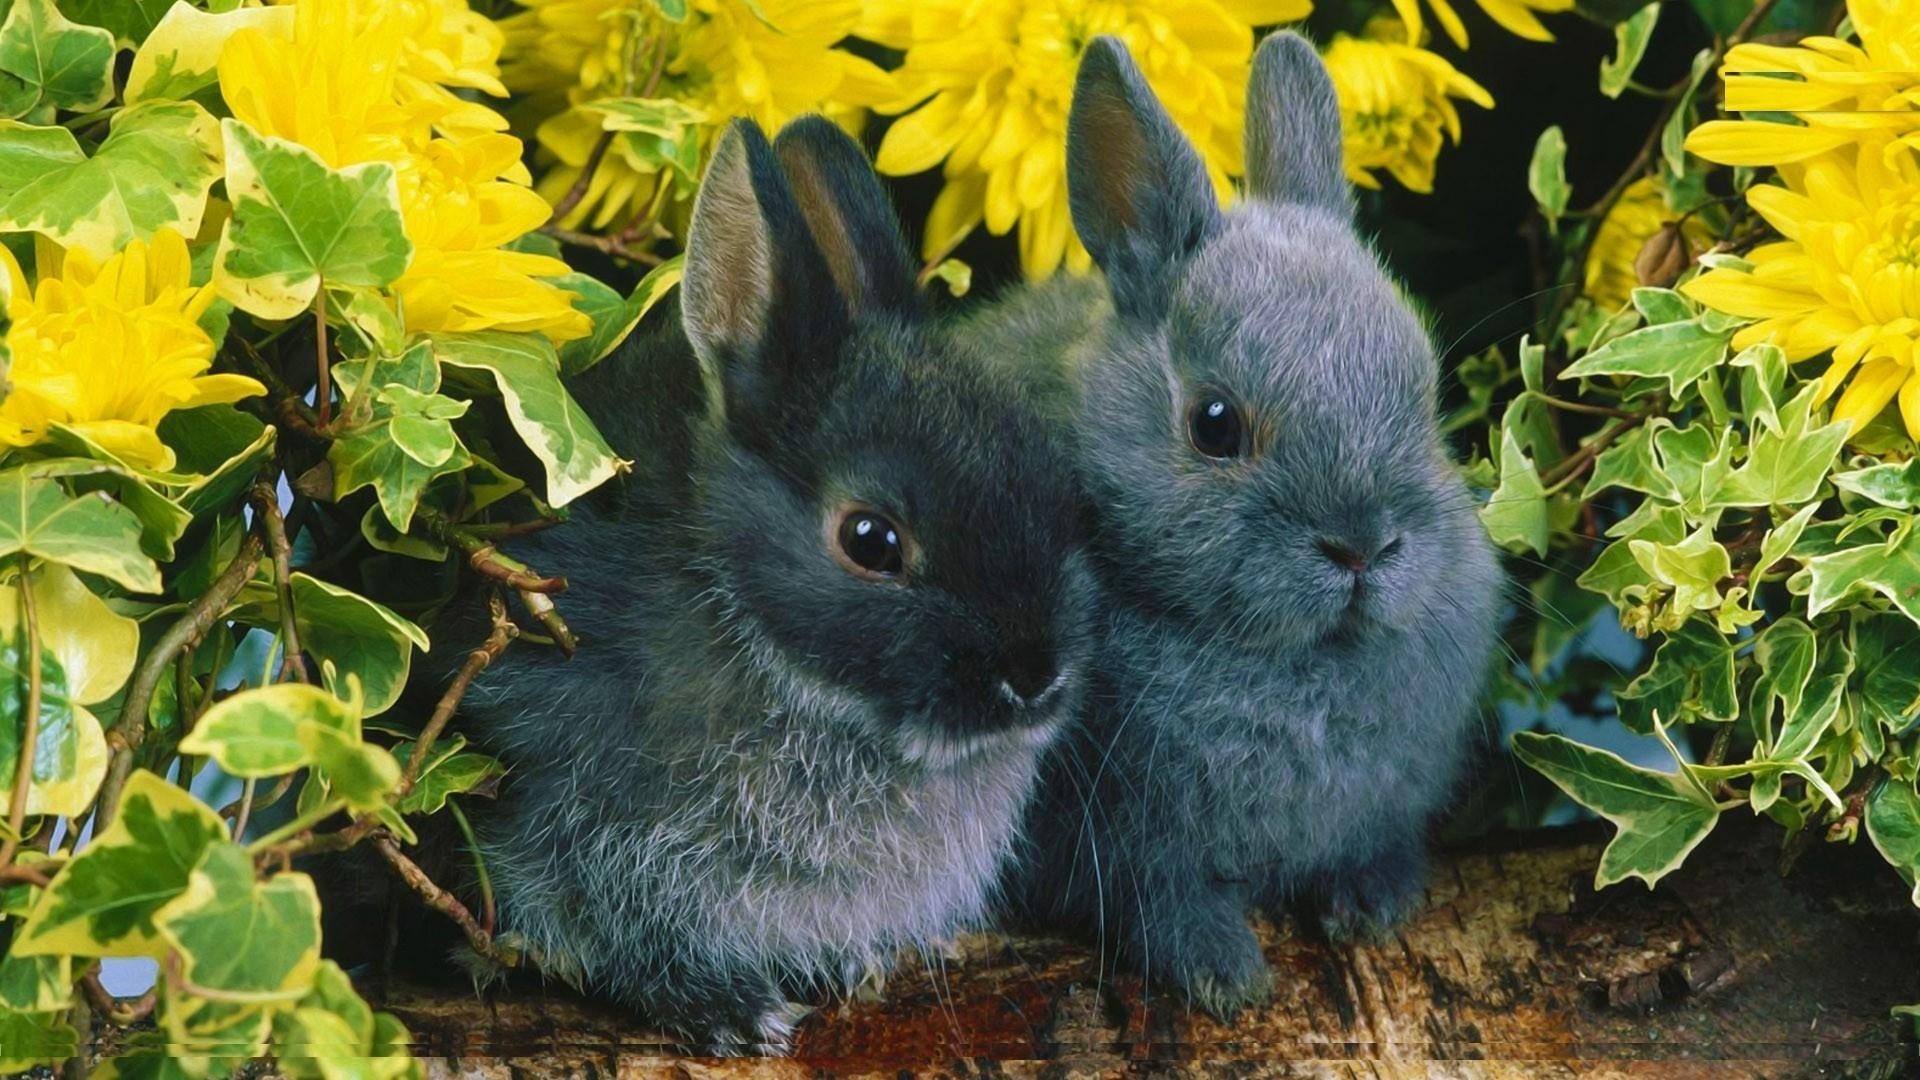 Cute Black Bunny Hd Wallpaper 25 Free Hd Wallpaper. Cute Black Bunny Hd  Wallpaper 25 Free Hd Wallpaper